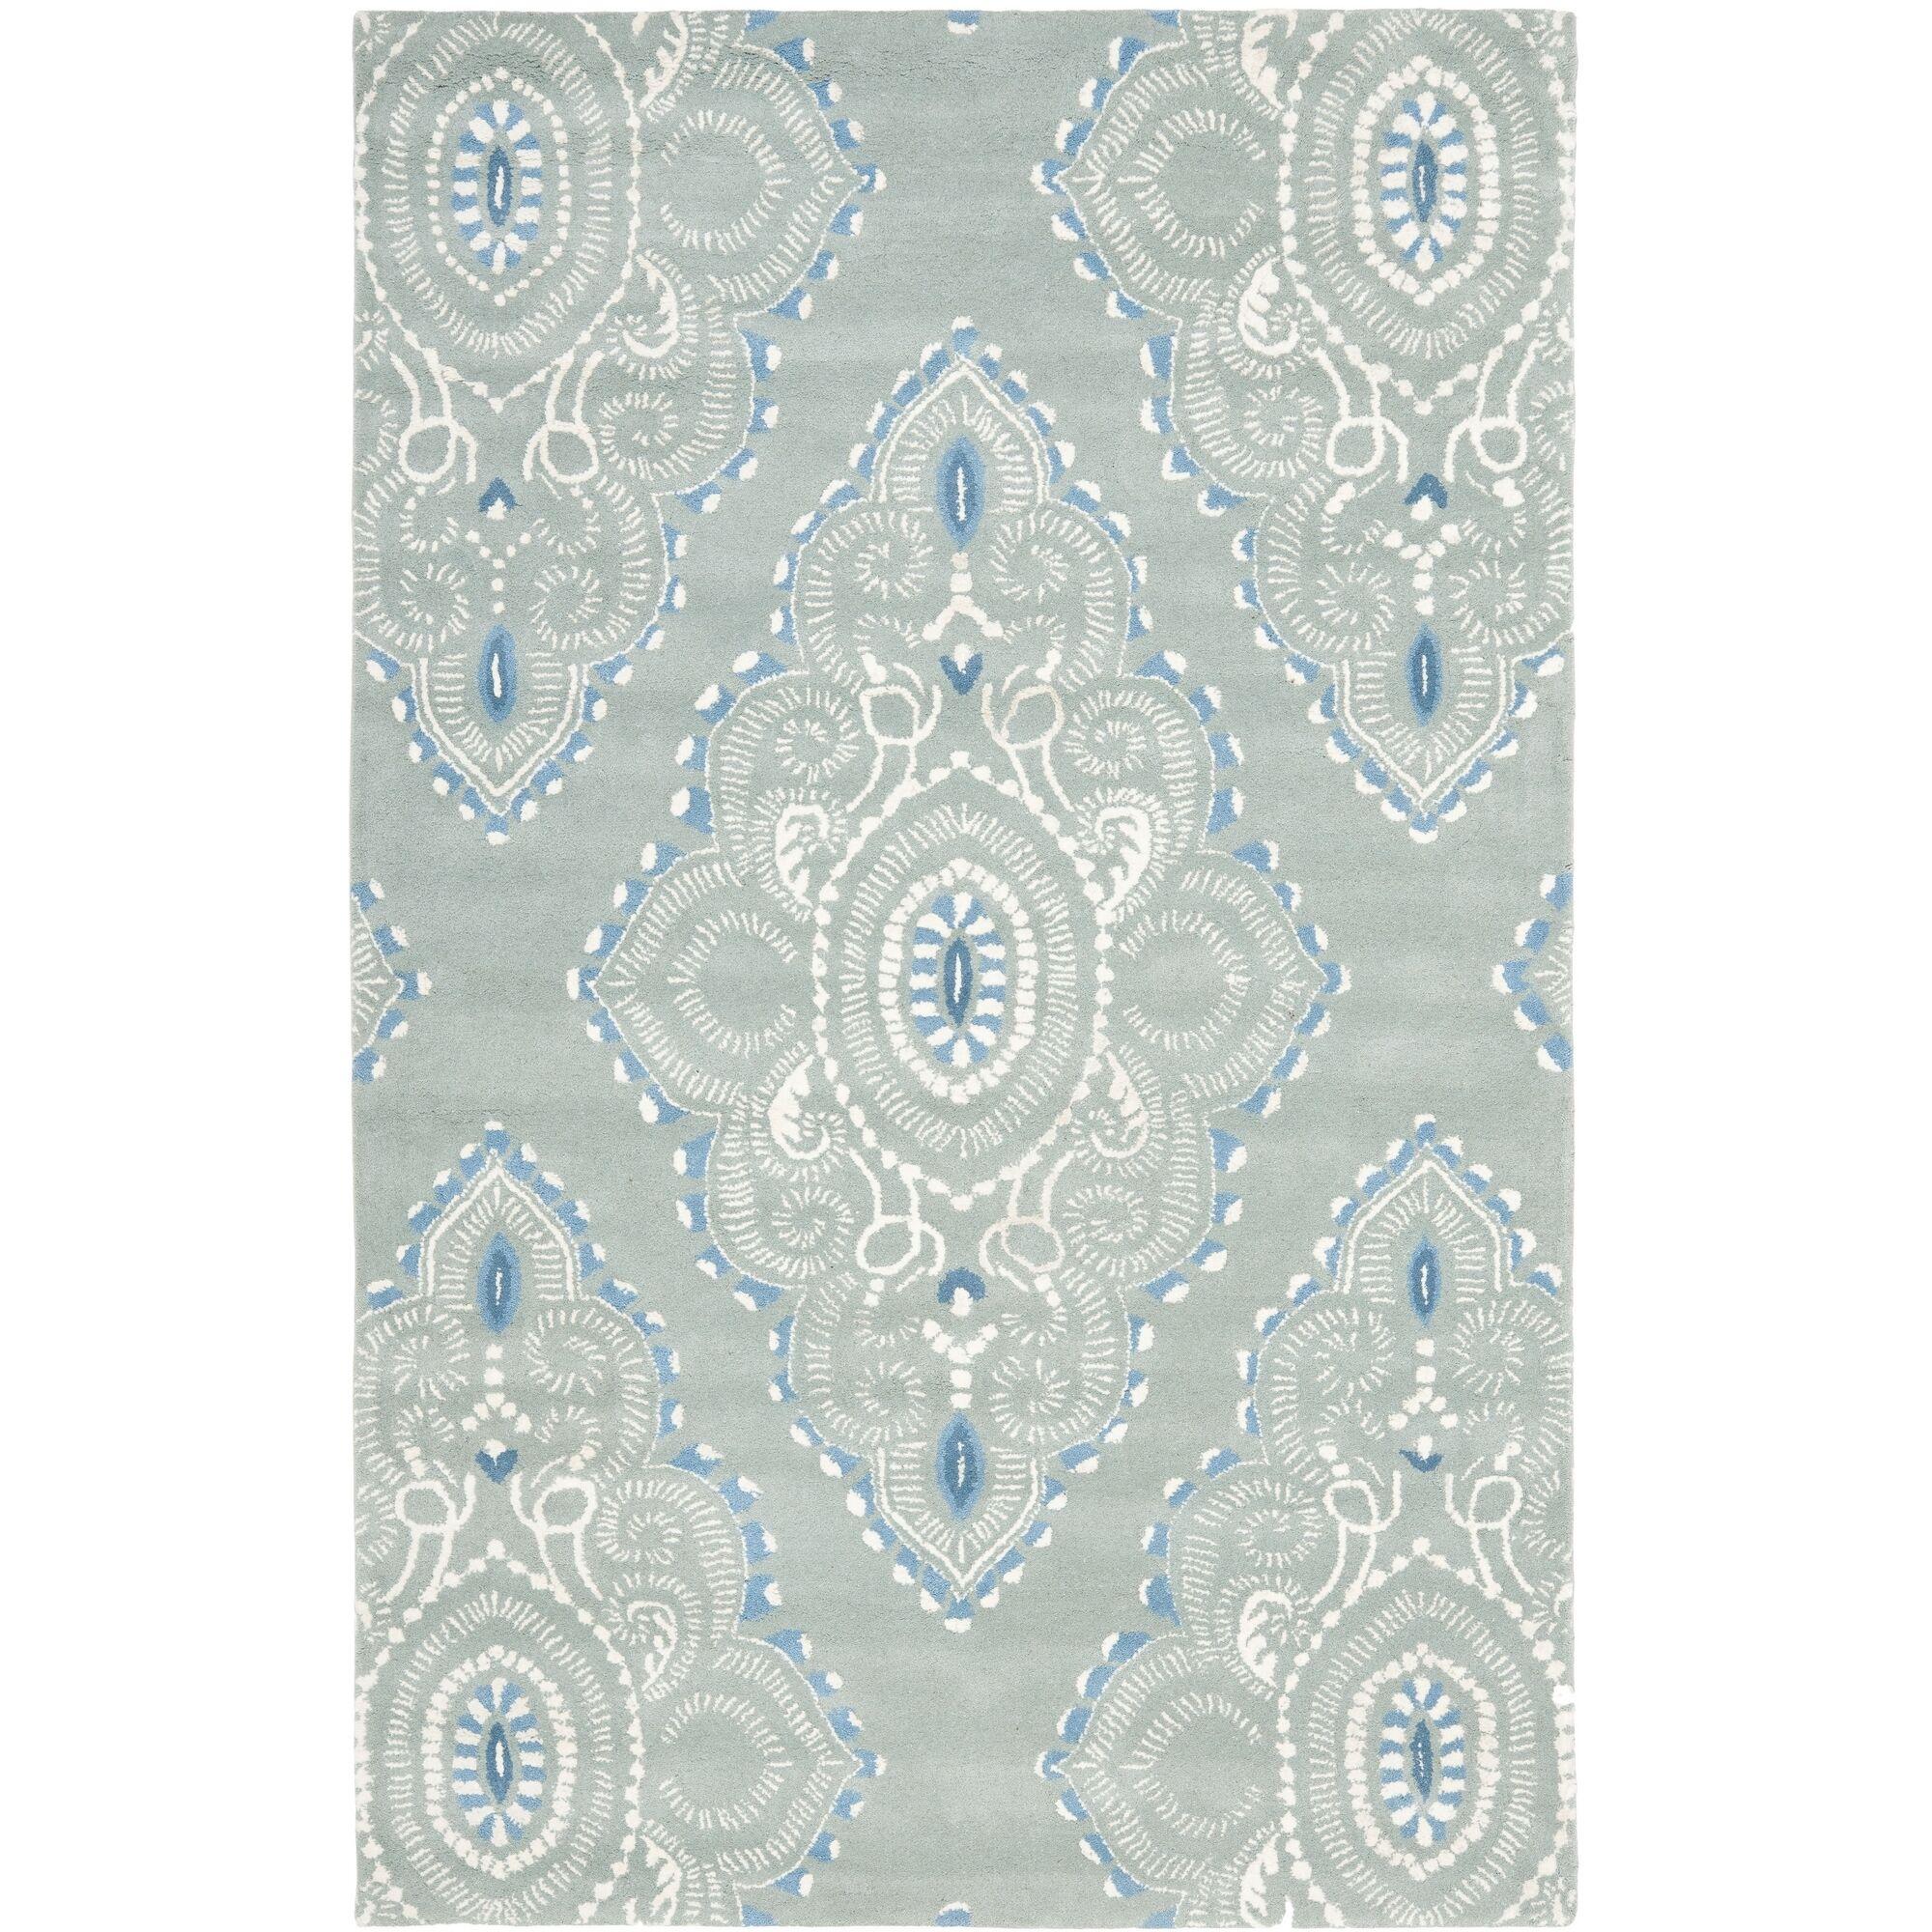 Colesberry Blue/Ivory Rug Rug Size: Rectangle 8' x 10'